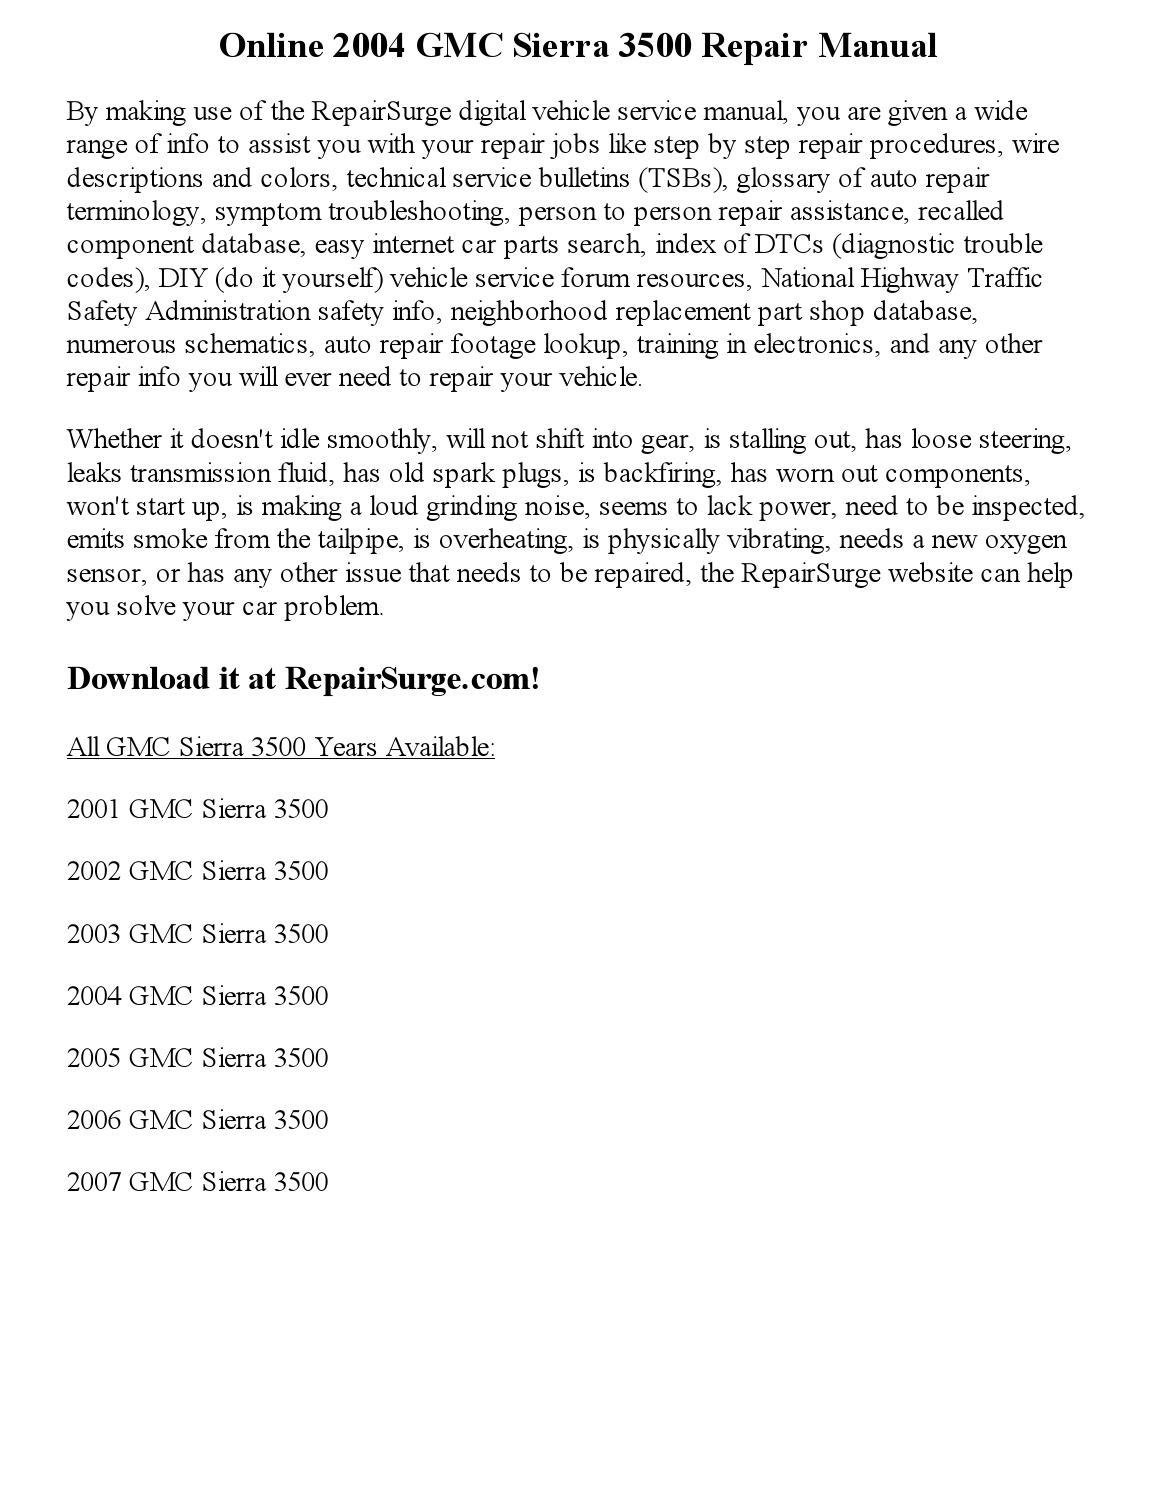 2004 Gmc Sierra 3500 Repair Manual Online By Kim Scotfield